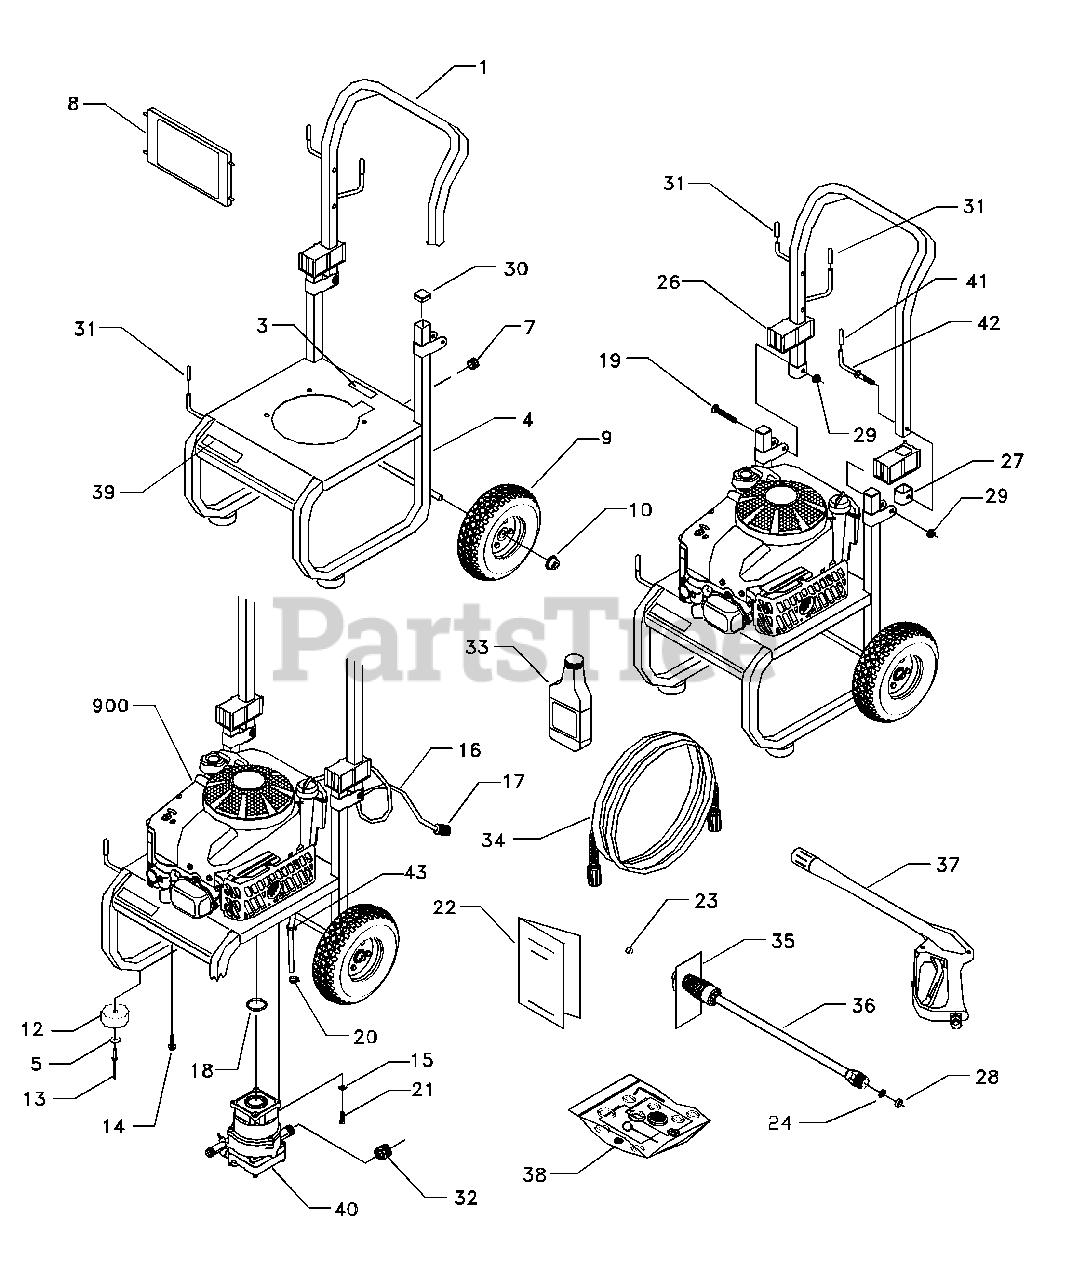 [ANLQ_8698]  Craftsman 580.767202 (1670-0) - Craftsman 2,250 PSI Pressure Washer Main  Unit Parts Lookup with Diagrams   PartsTree   Wiring Diagram For Craftsman Pressure Washer      PartsTree